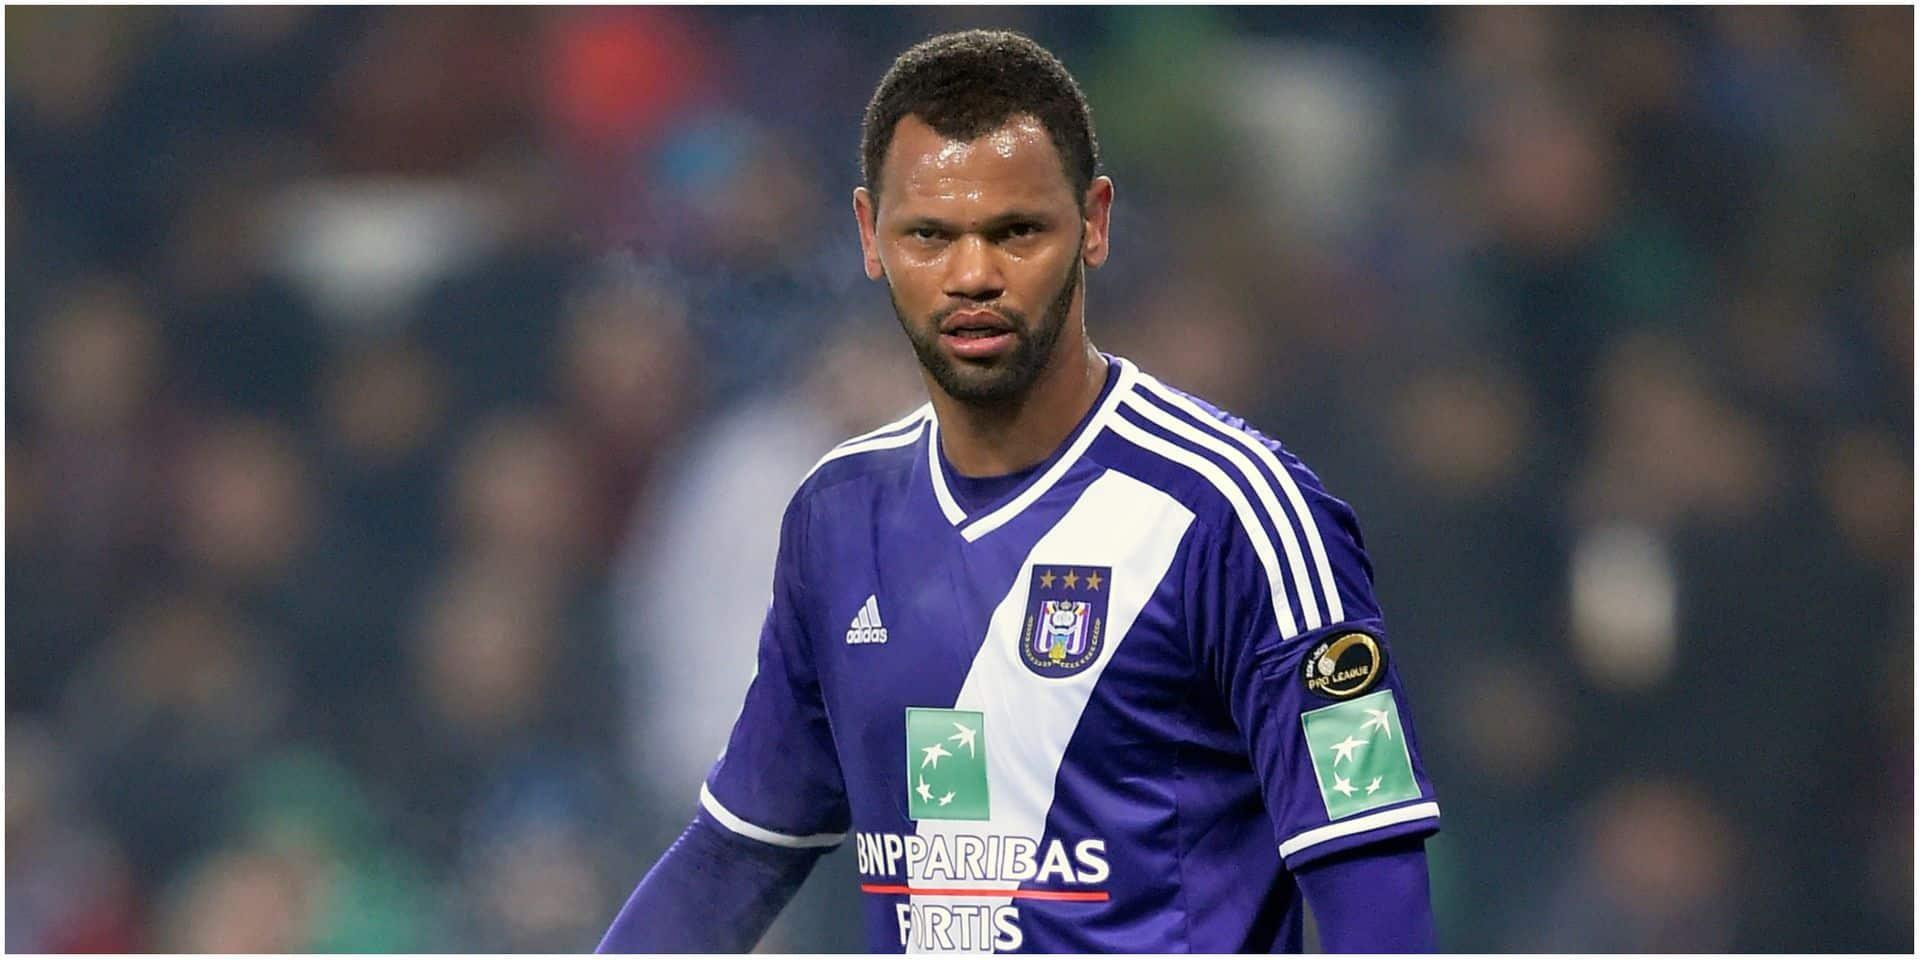 Rolando (ex-Anderlecht) signe au Sporting Braga